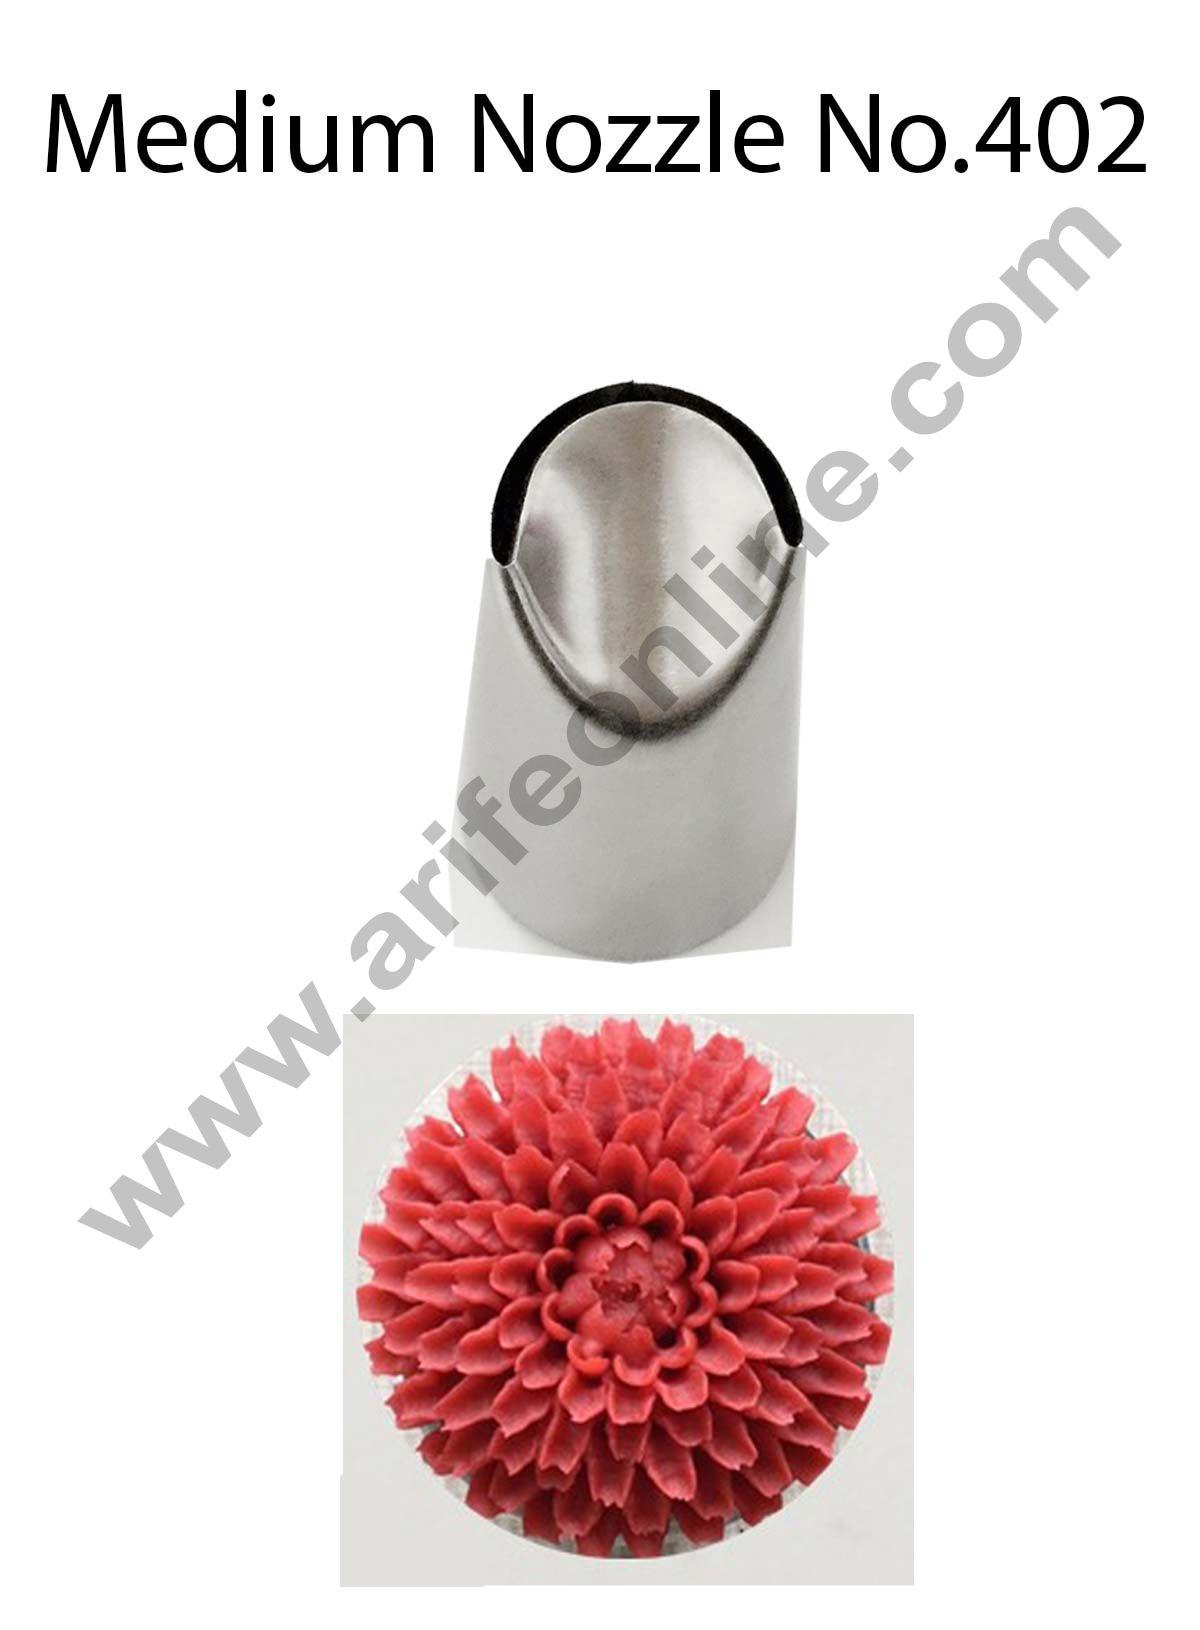 Cake Decor Medium Nozzle - No. 402 Medium Ruffle Frill Piping Nozzle